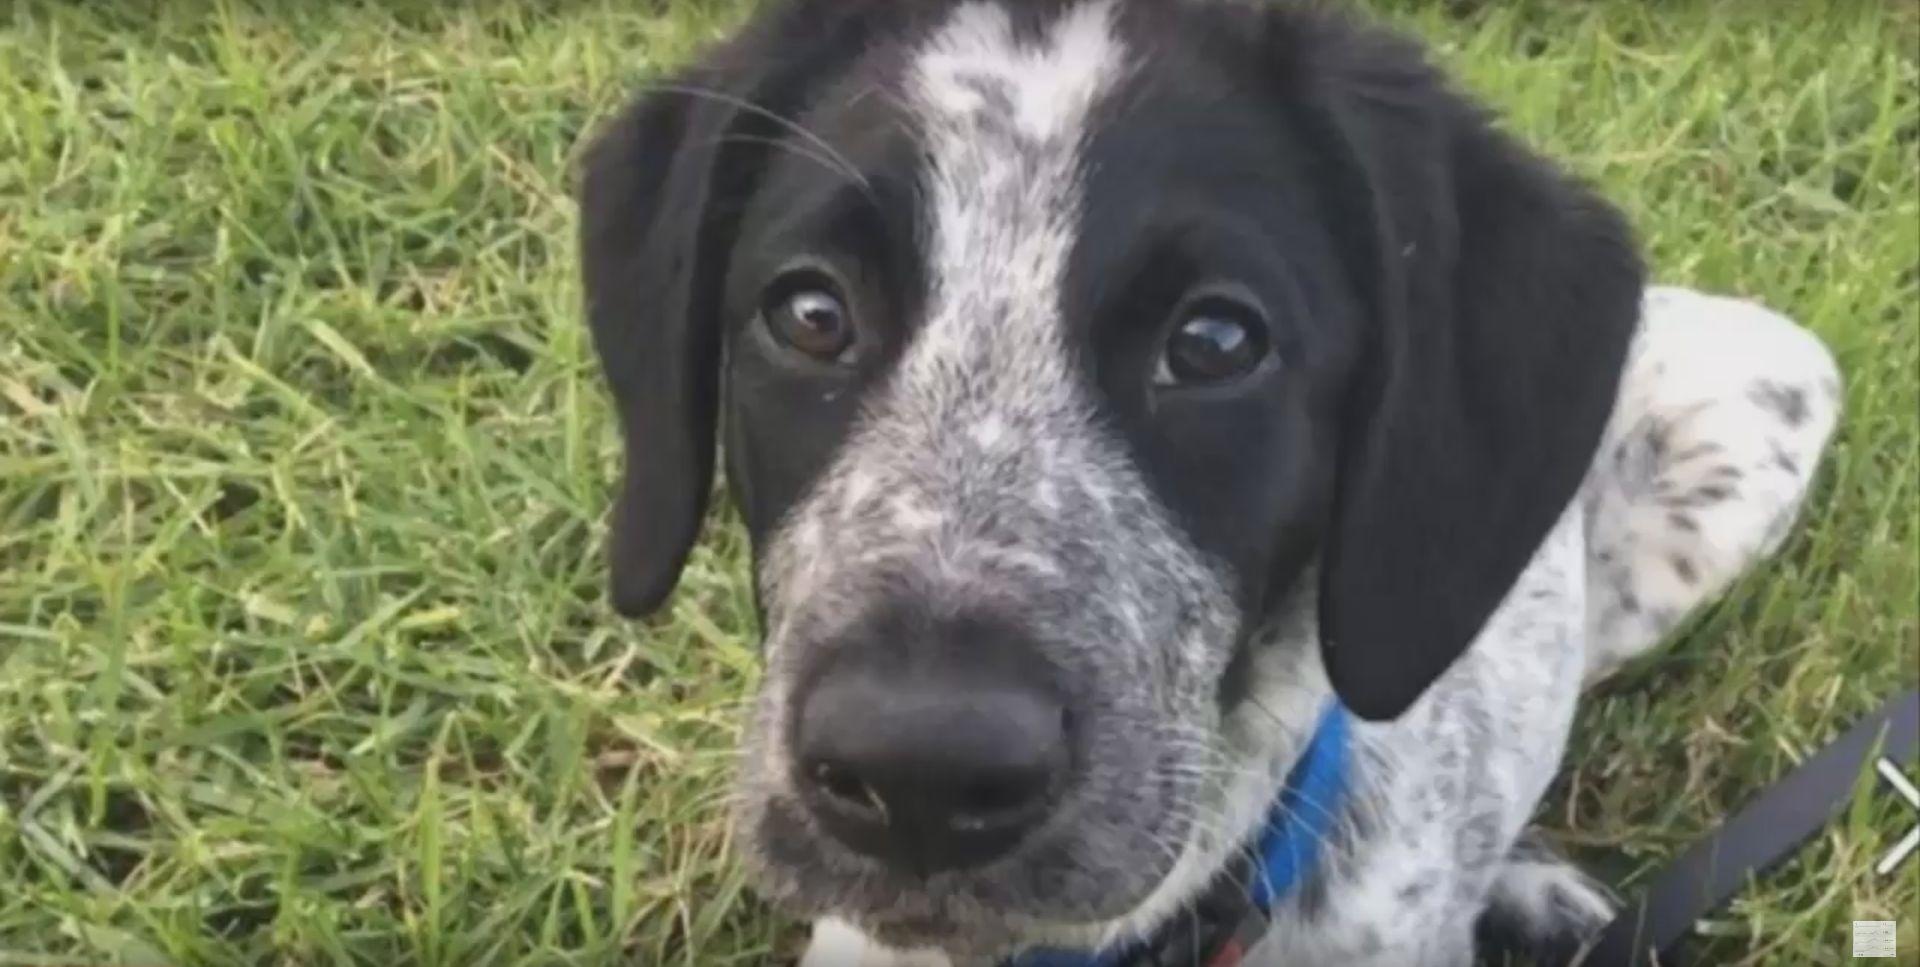 NOVI ZELAND Policija ubila psa tragača, javnost ogorčena